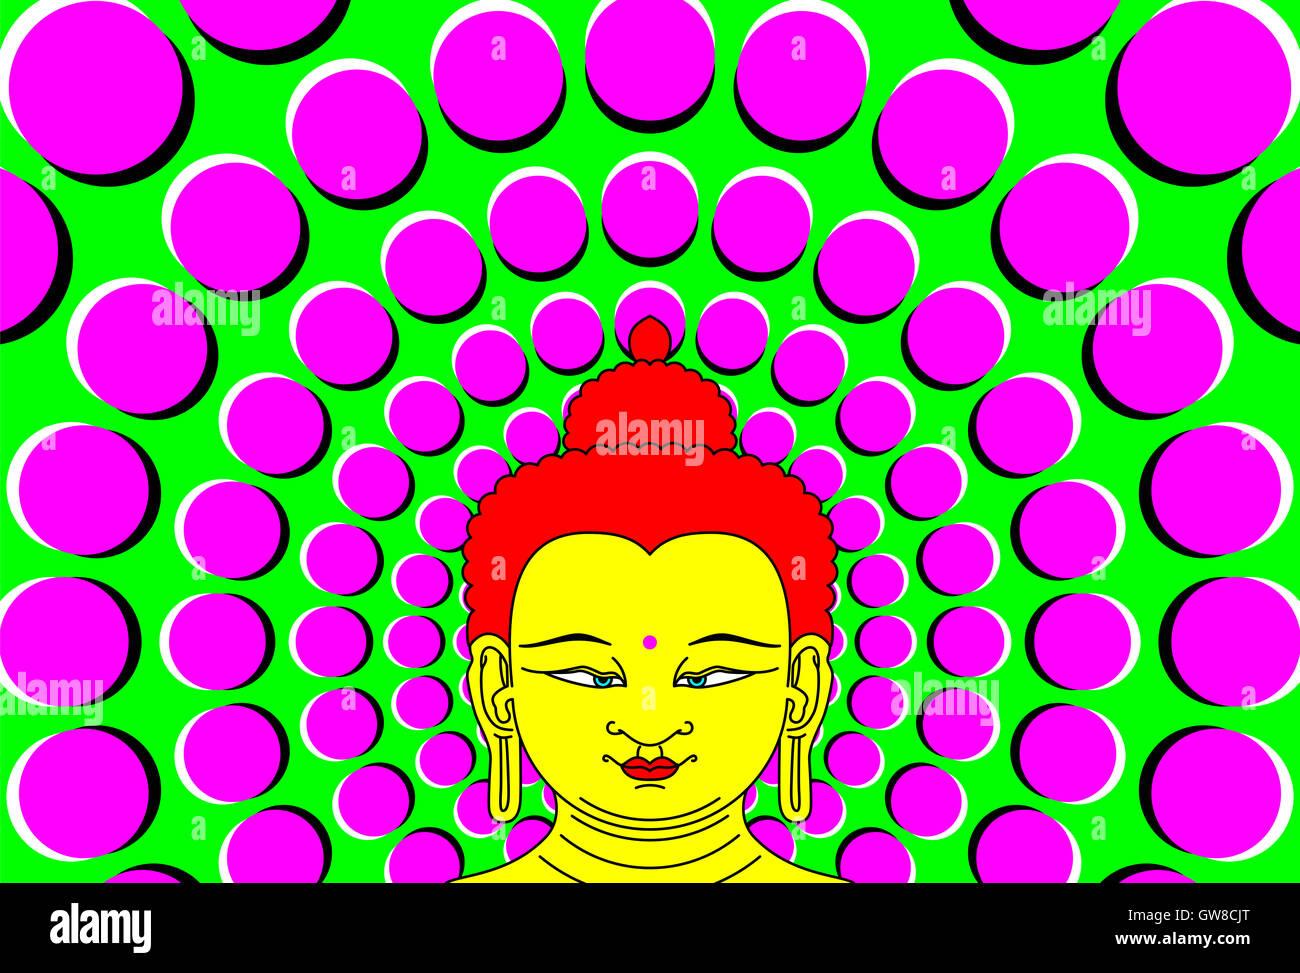 Psychedelic Buddha with moving background. Transcendent Bodhisattva illustration with peripheral drift optical illusion. - Stock Image